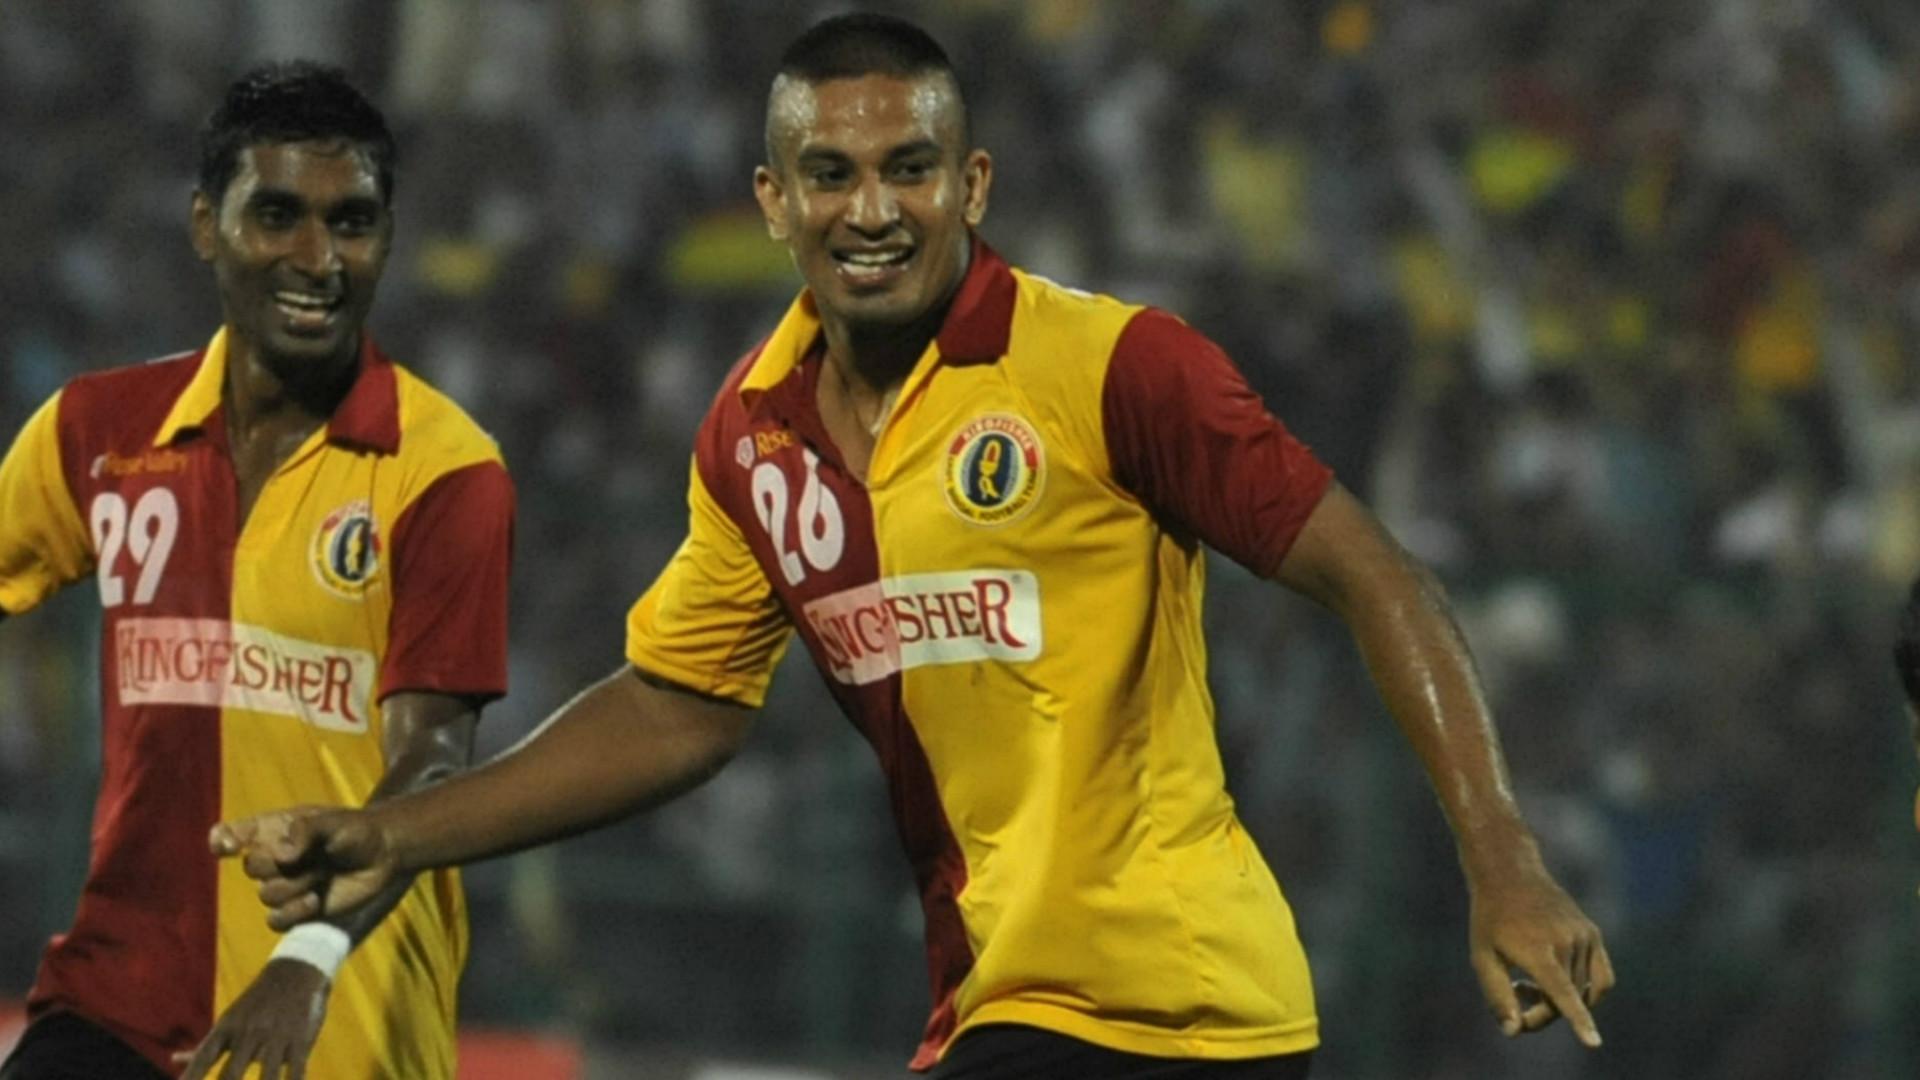 I-League: Manandeep Singh joins Mohun Bagan training